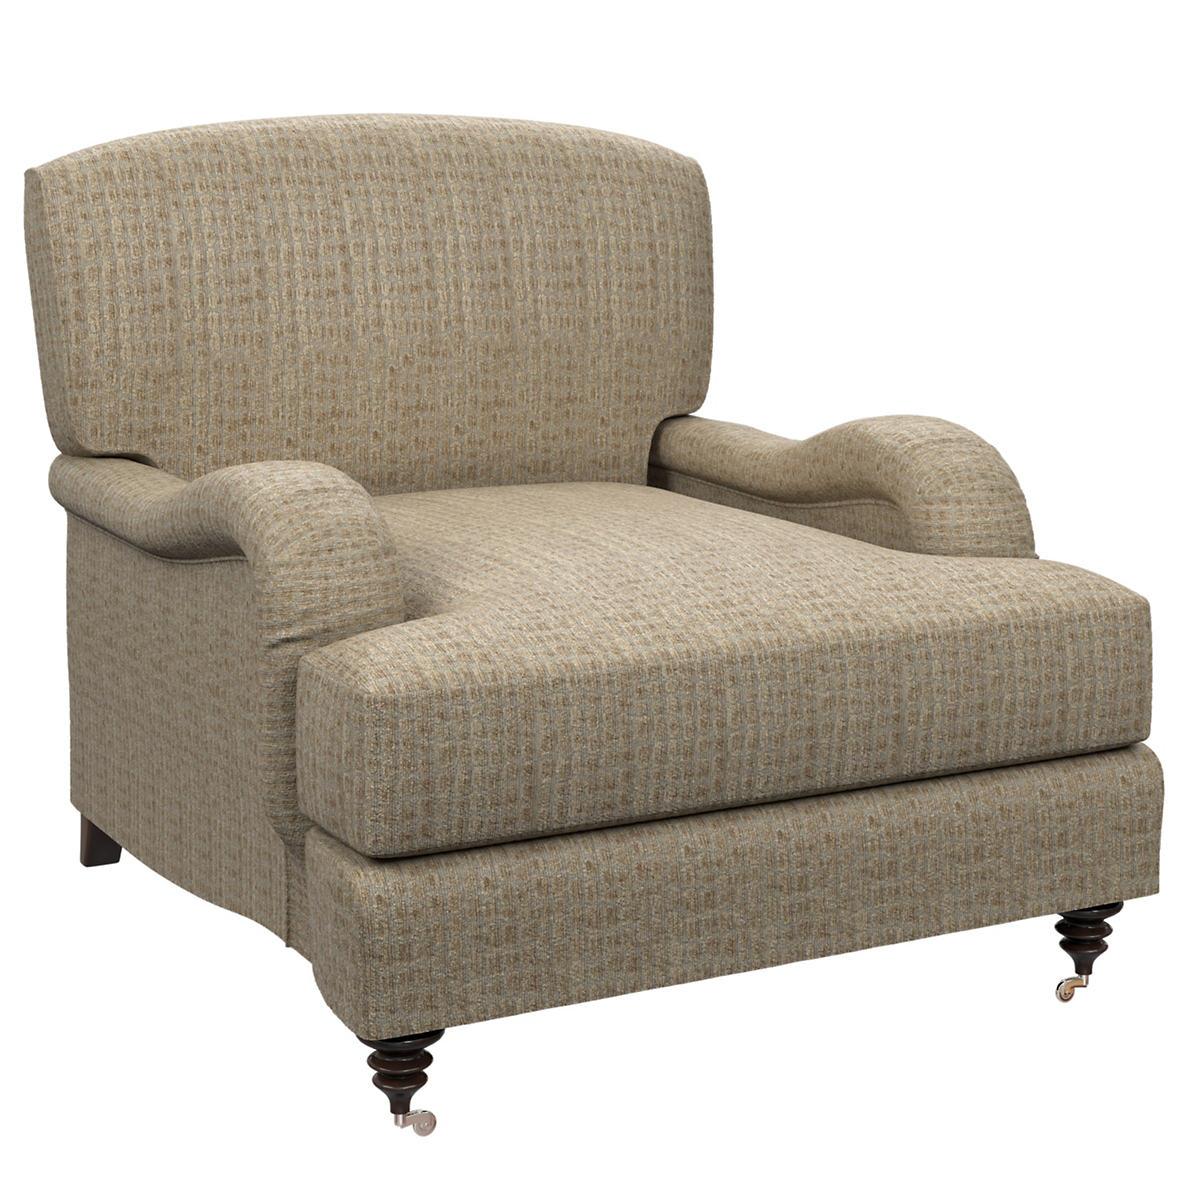 Pebble Sand Litchfield Chair